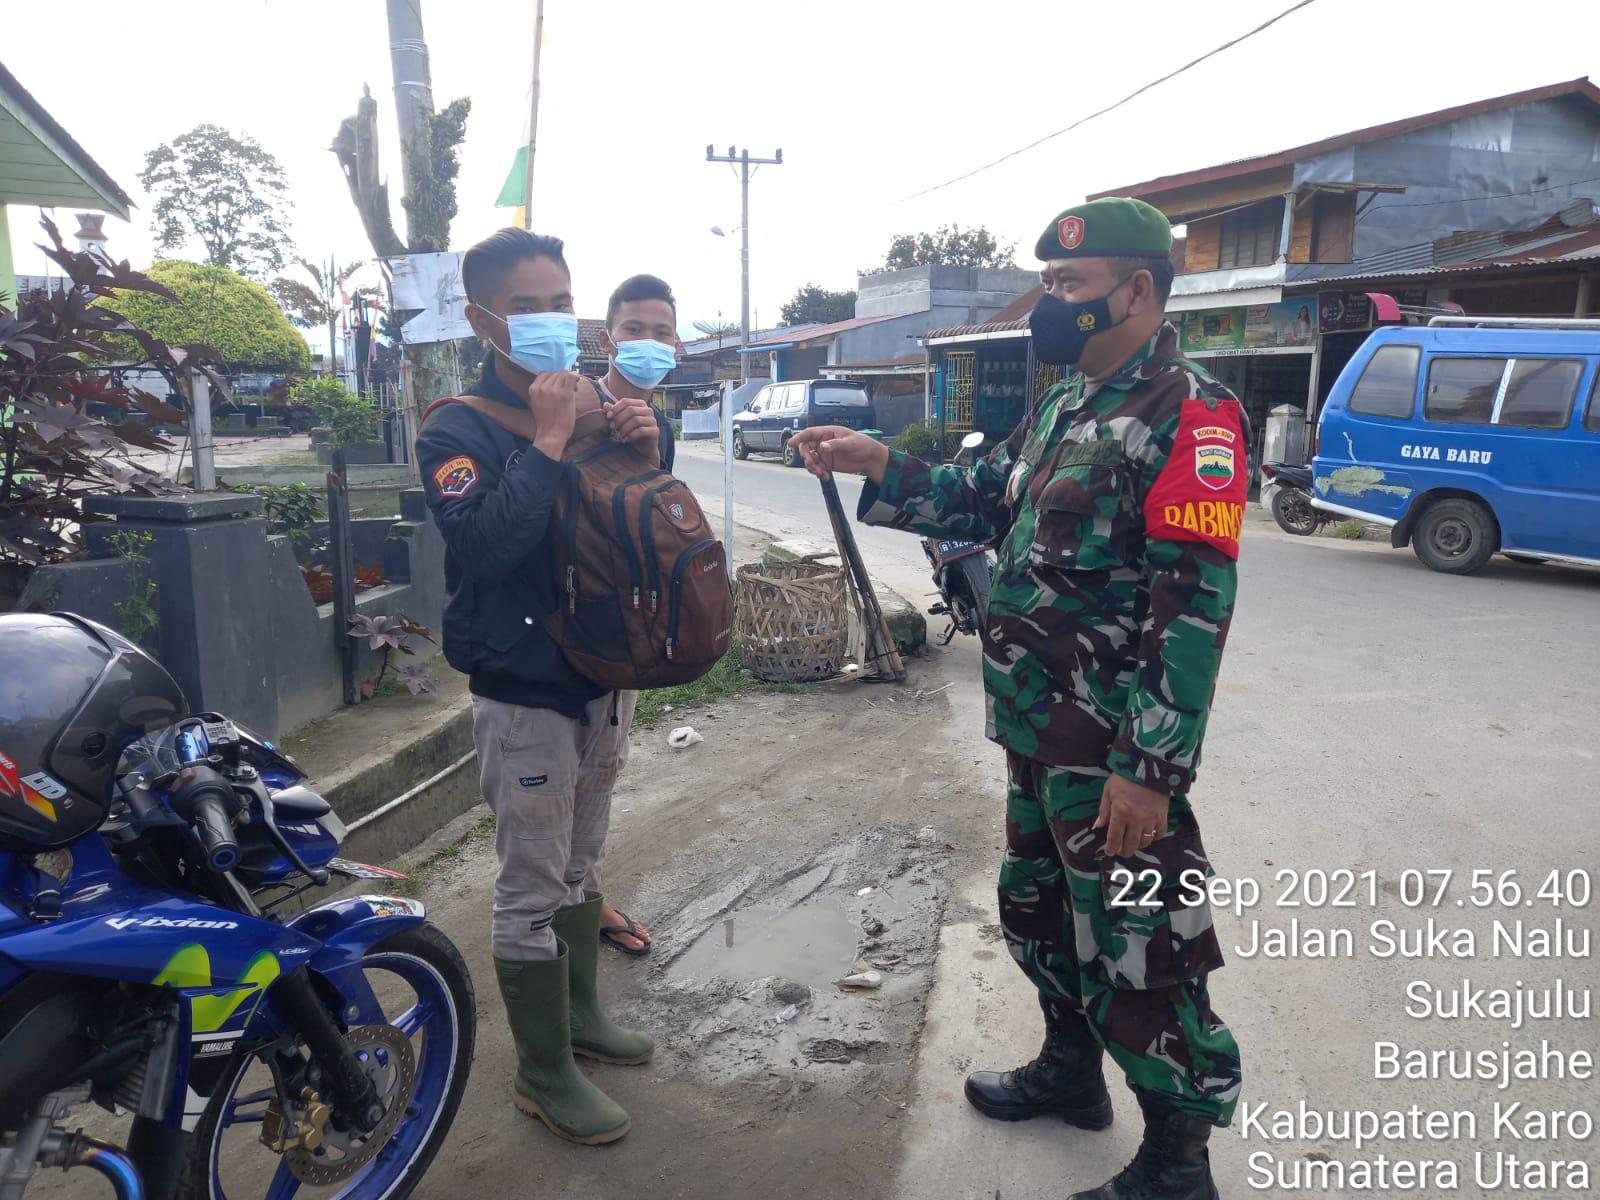 Selalu Ingatkan Warganya Pakai Masker, Babinsa Koramil 01/BJ Gencar Sosialisasikan Protokol Kesehata